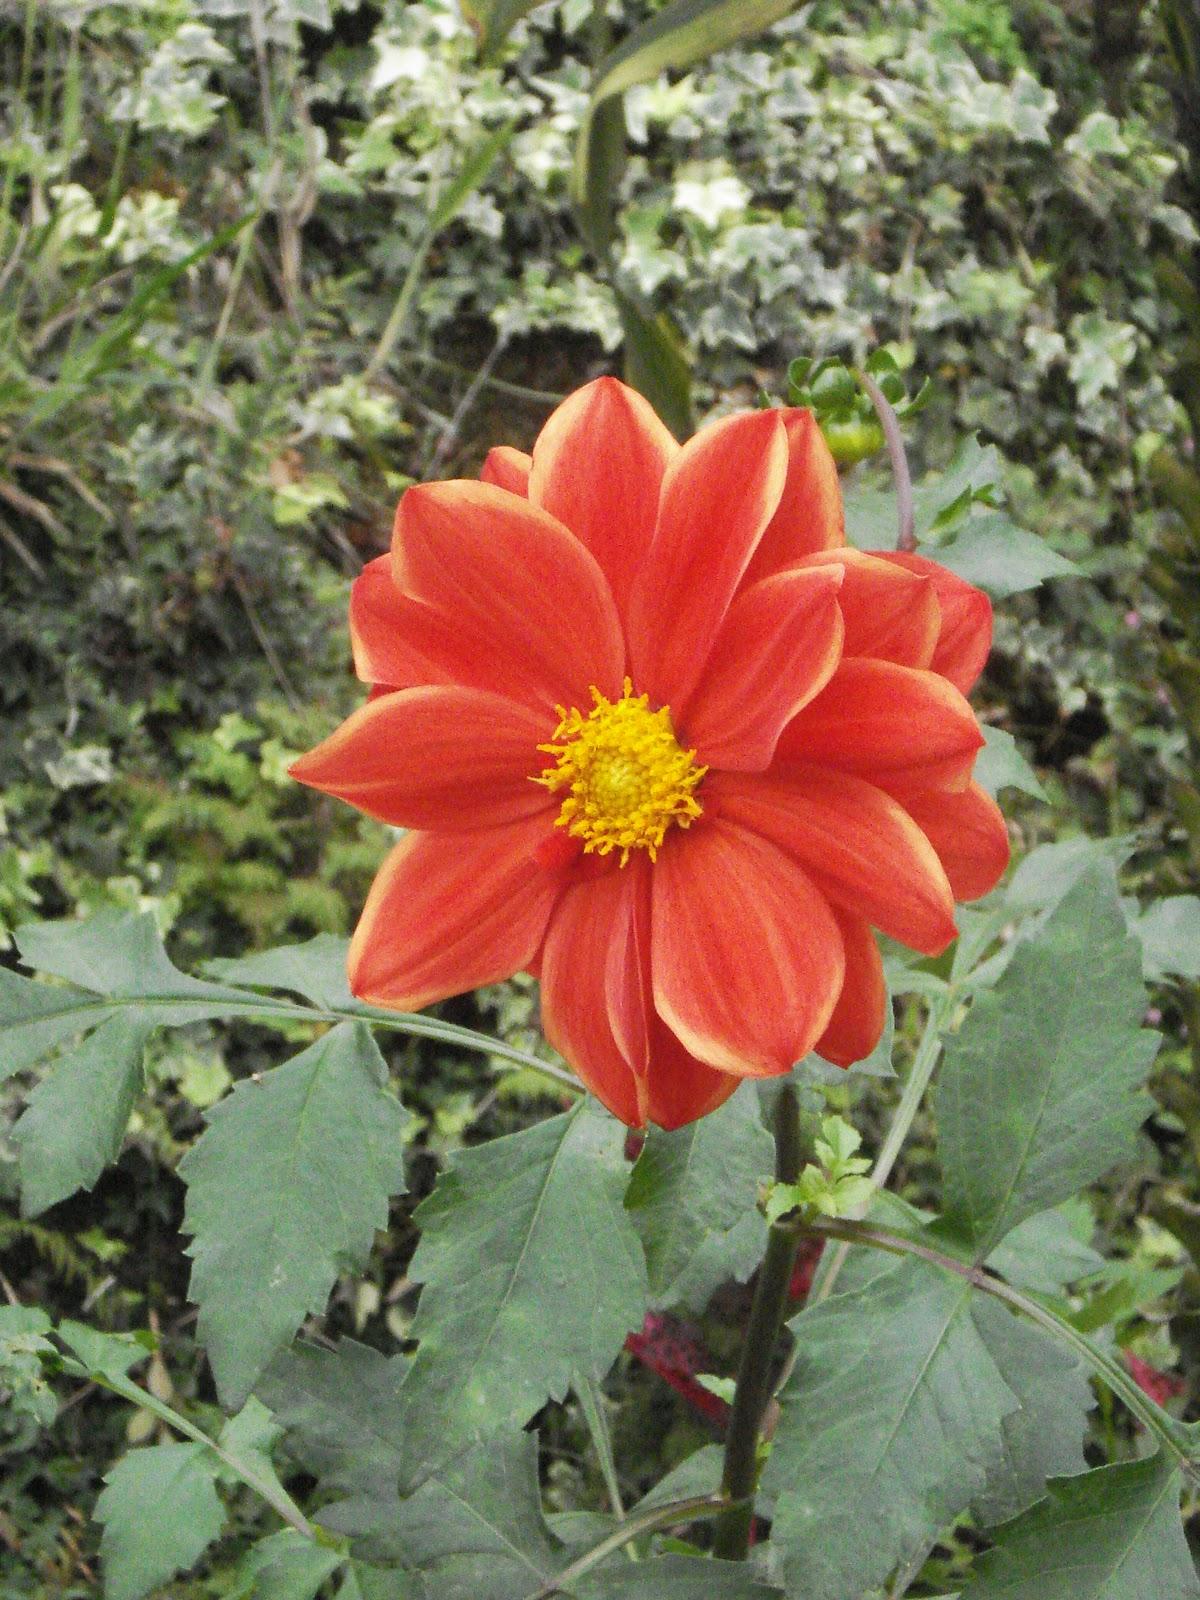 DK CELLULER,RIKILLAGASKADA: deliya flowers